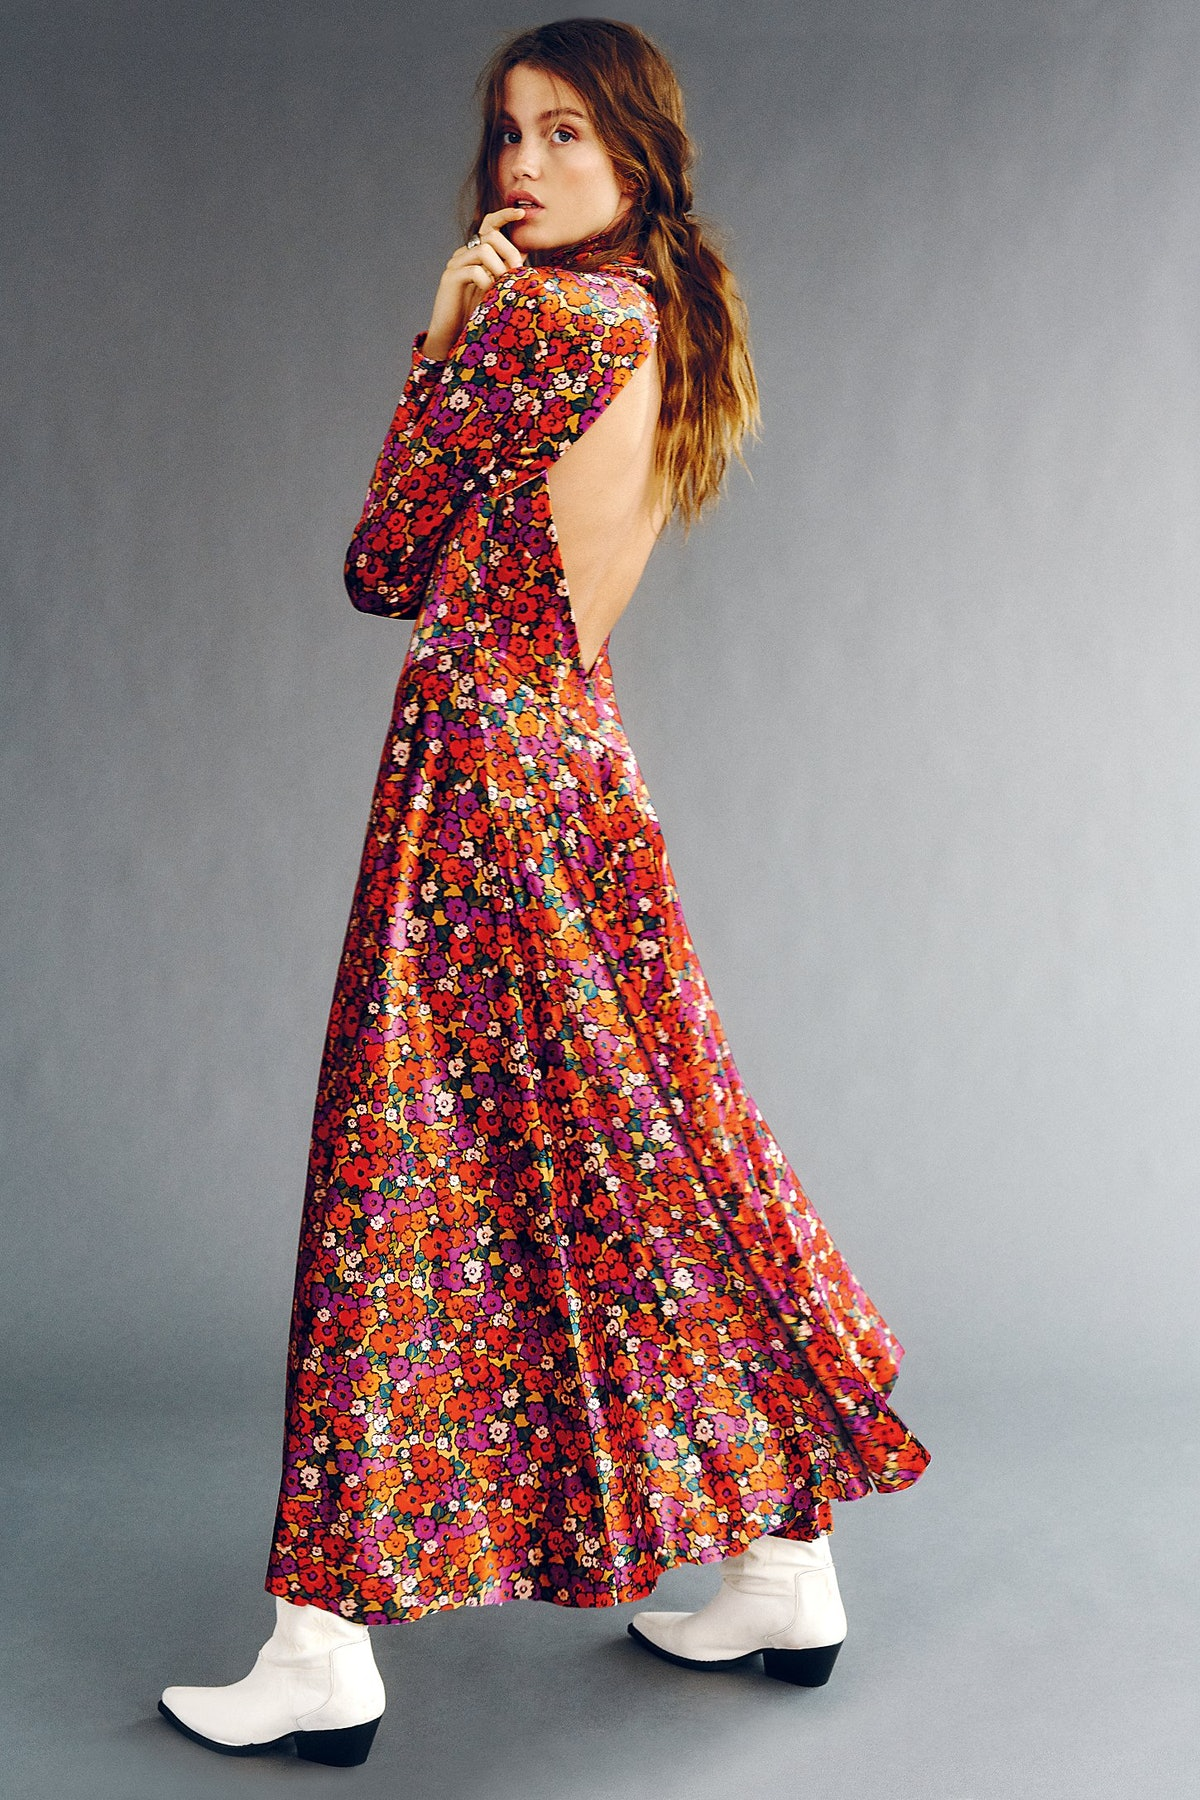 Heartland Crushed Velvet Maxi Dress